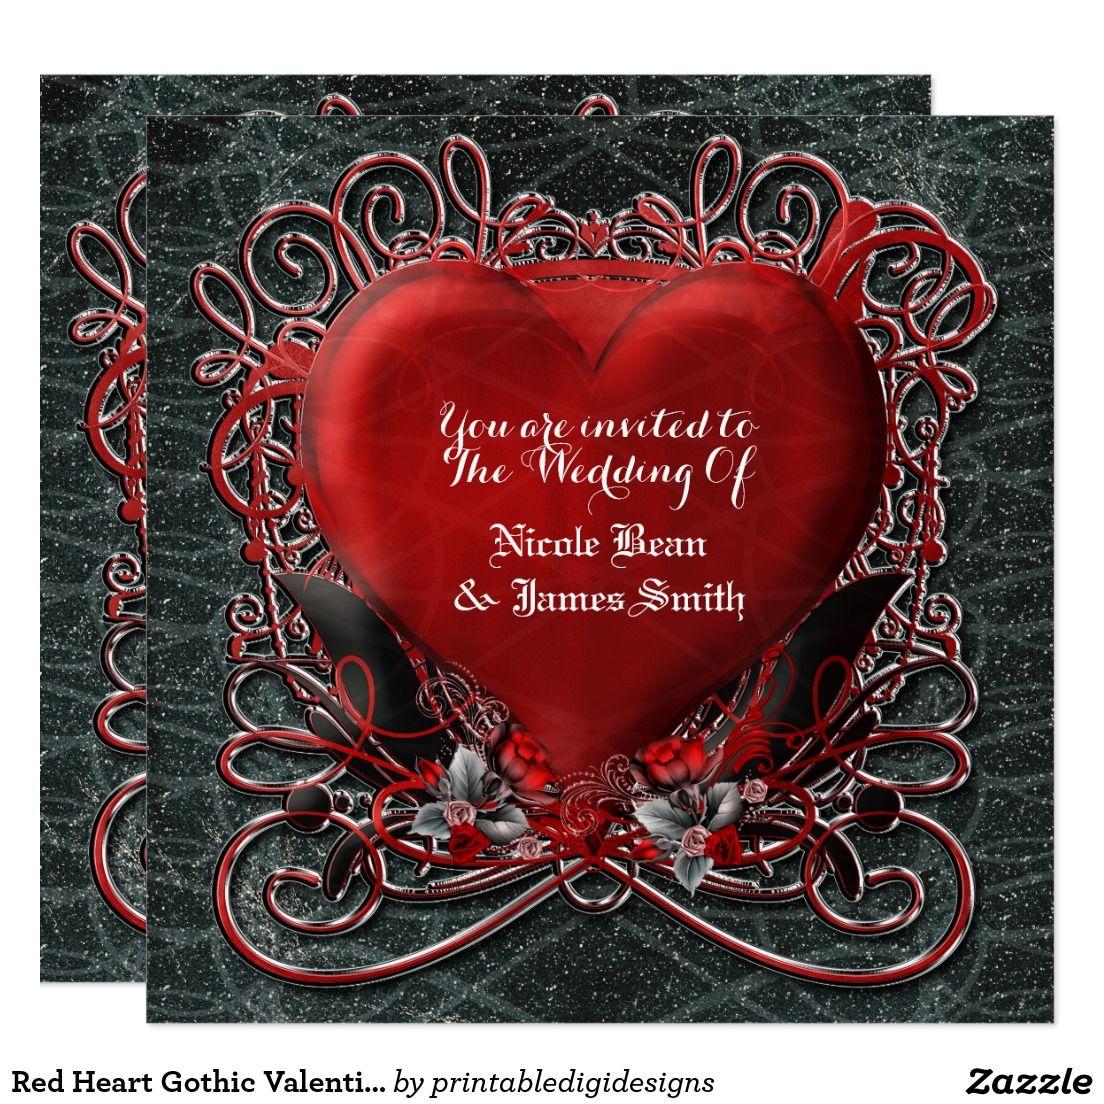 Red Heart Gothic Valentine Wedding Invitations | Gothic Romance ...